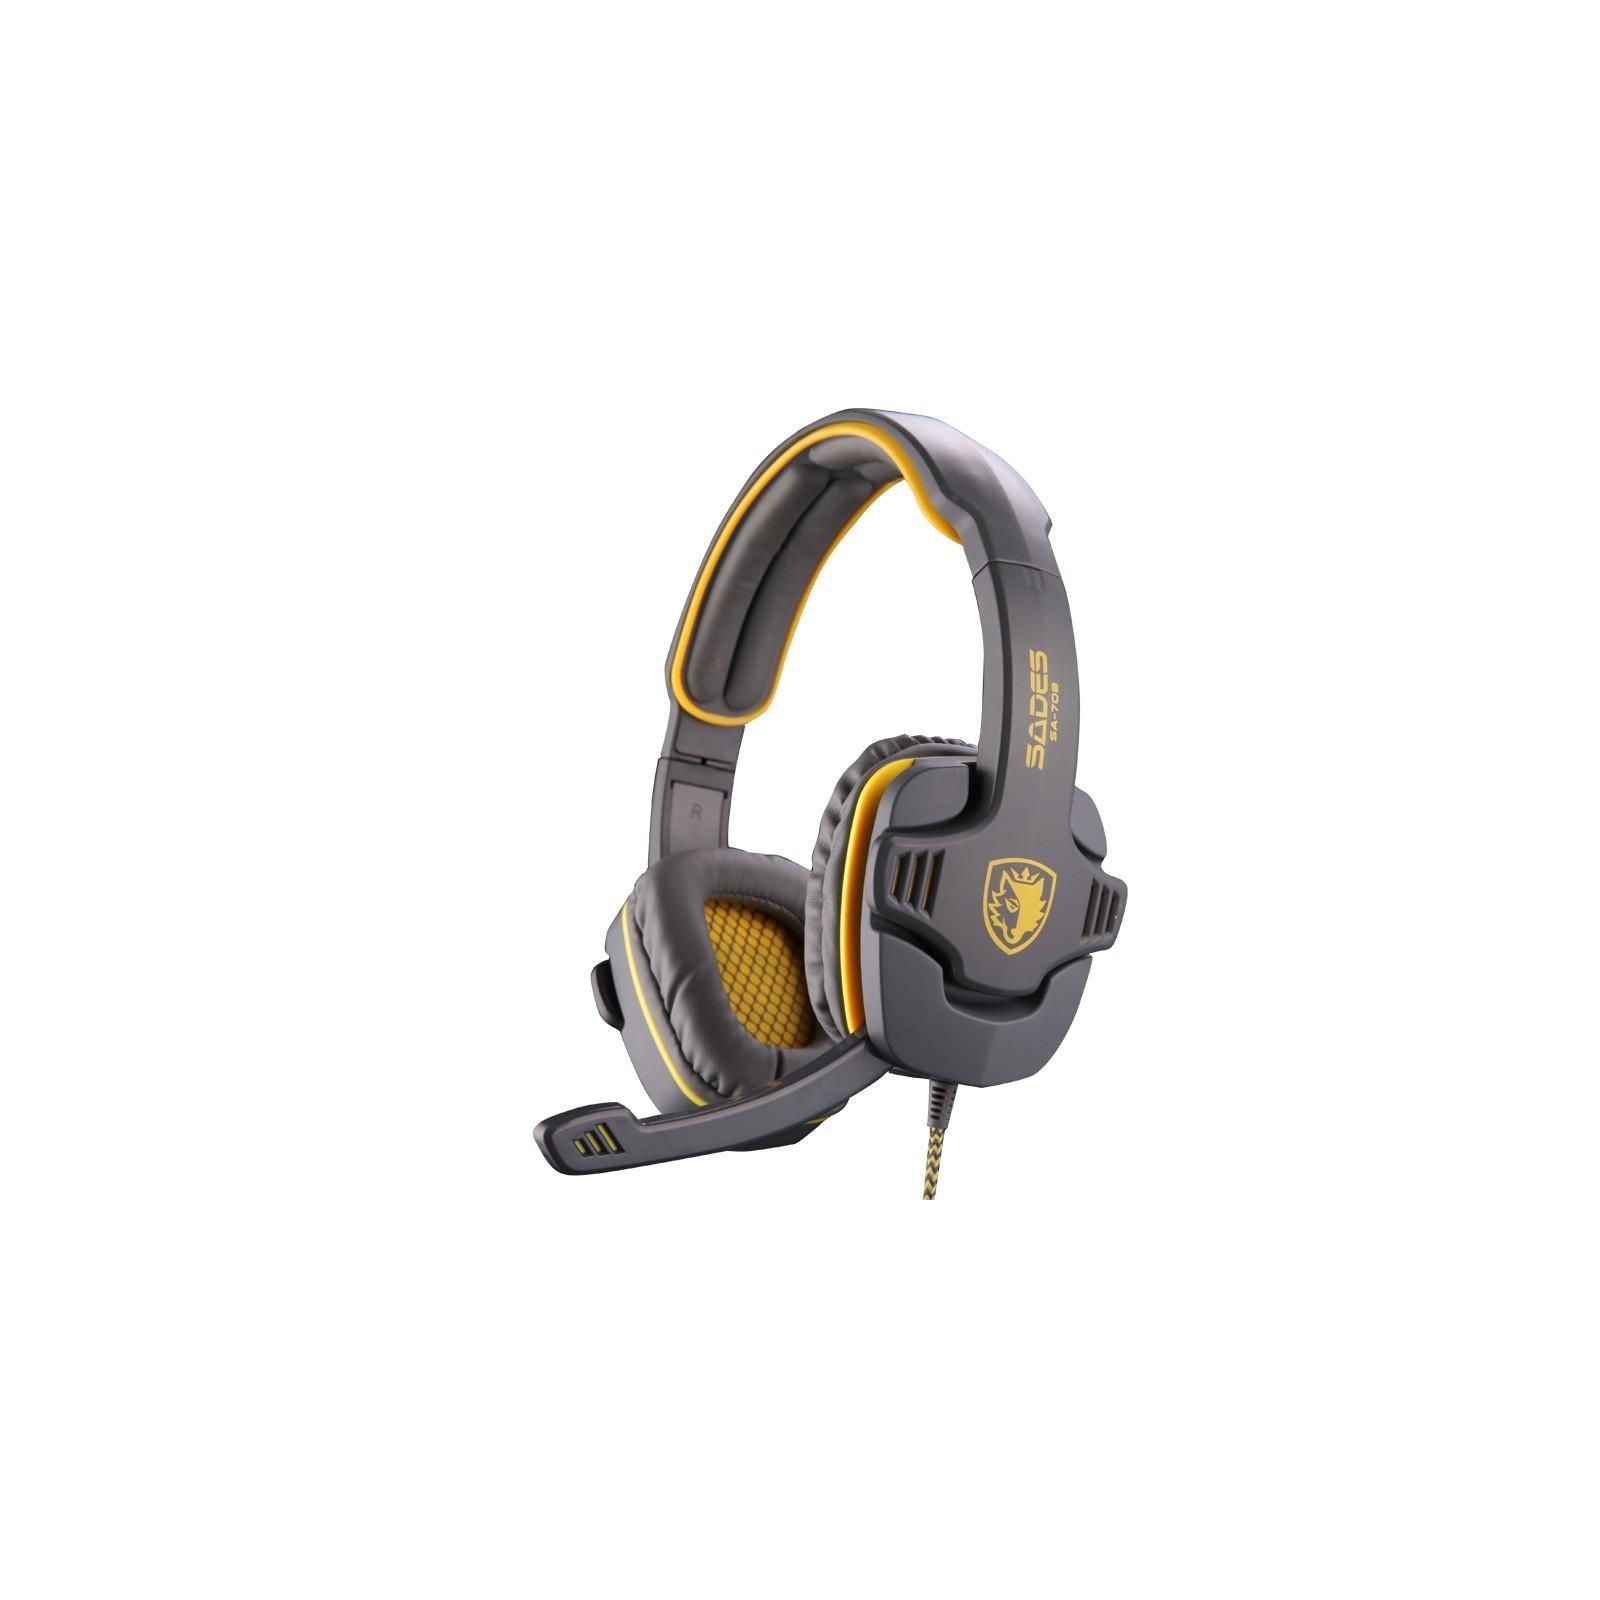 Наушники SADES Gpower Grey/Yellow (SA708-G-Y) изображение 2